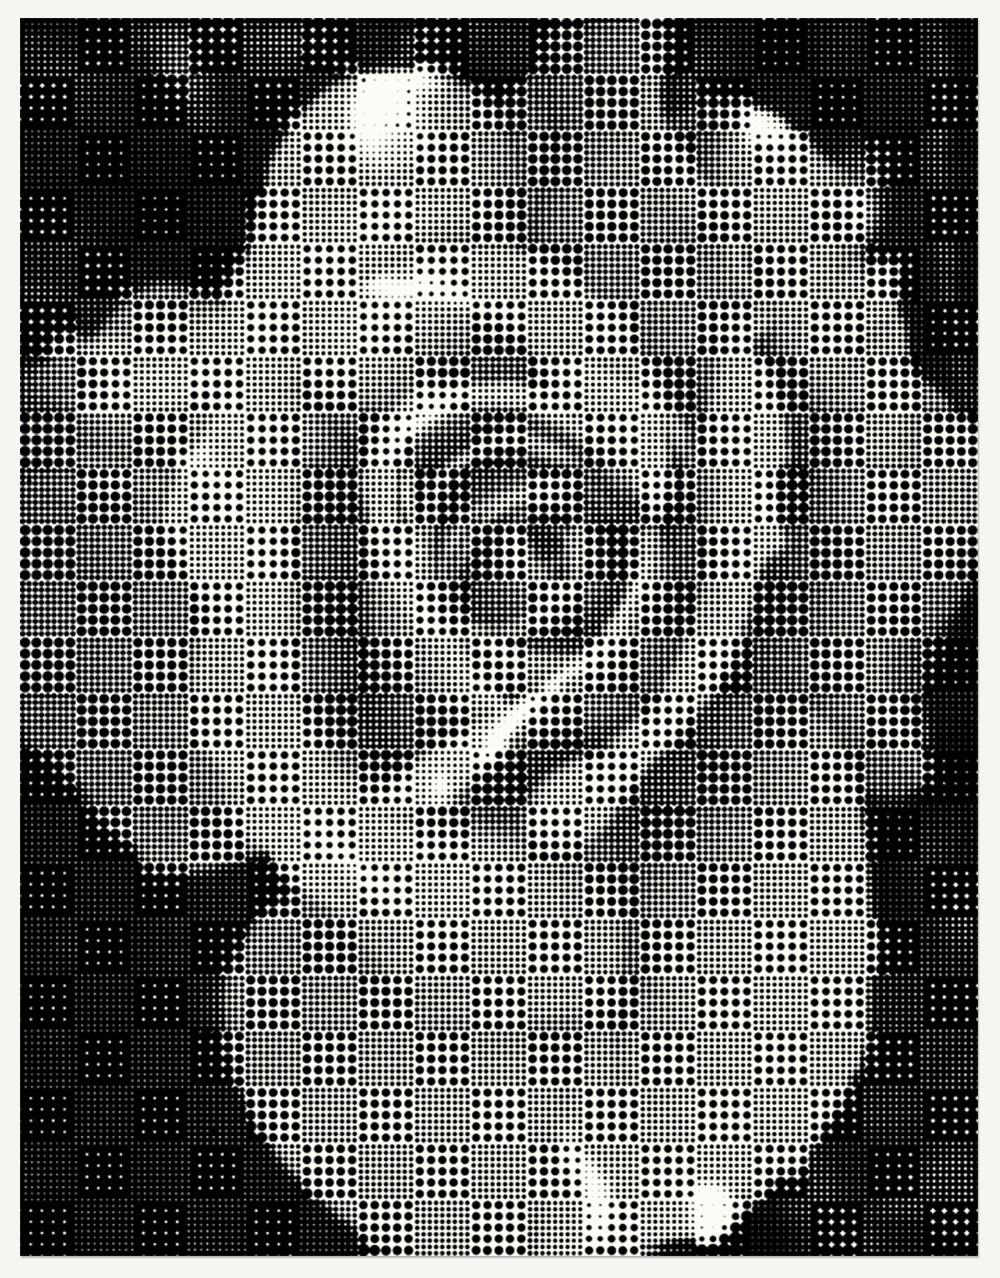 ROSE - LARGE.jpg